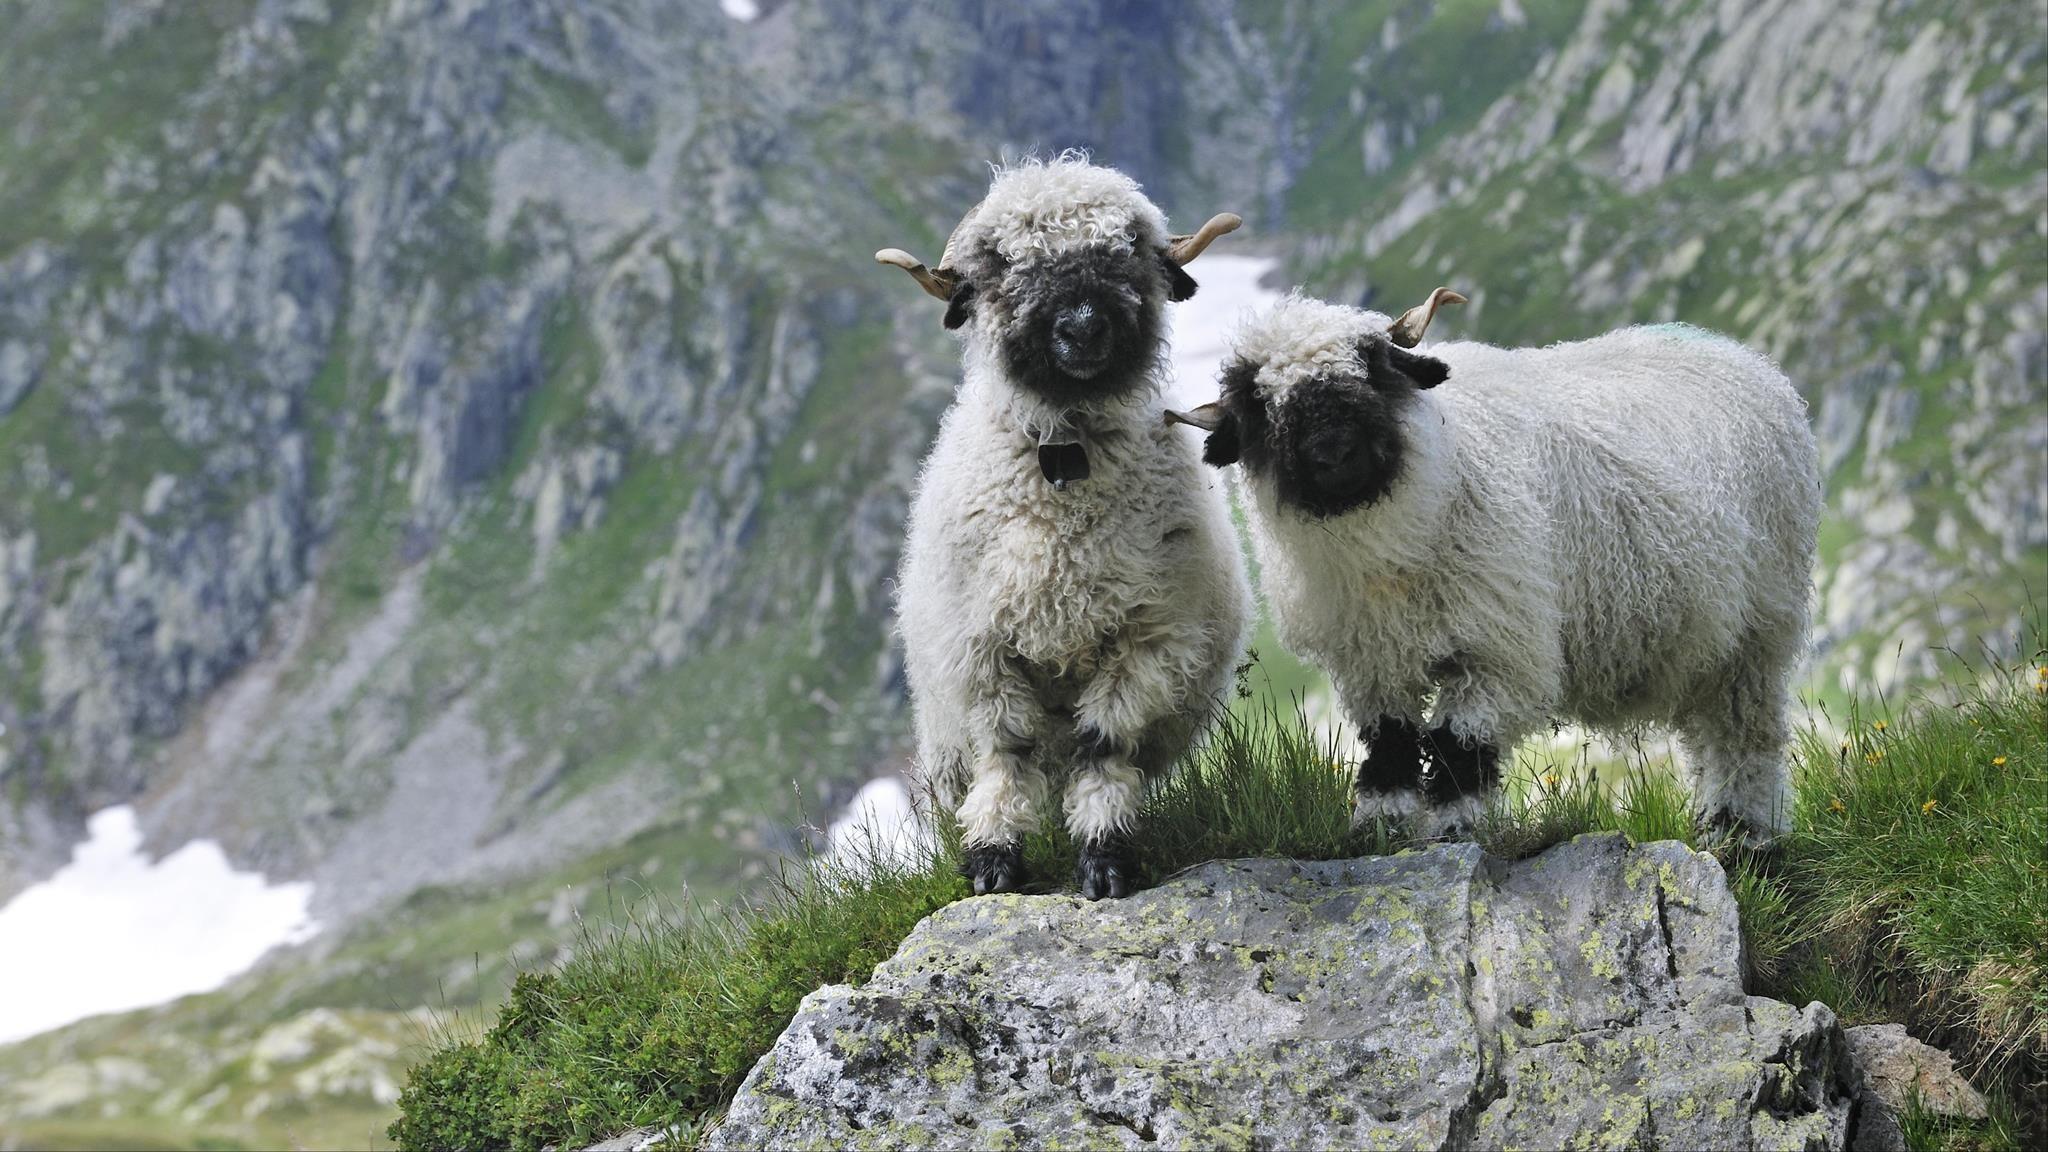 Sheep Love   Cute animals, Baby animals, Animals